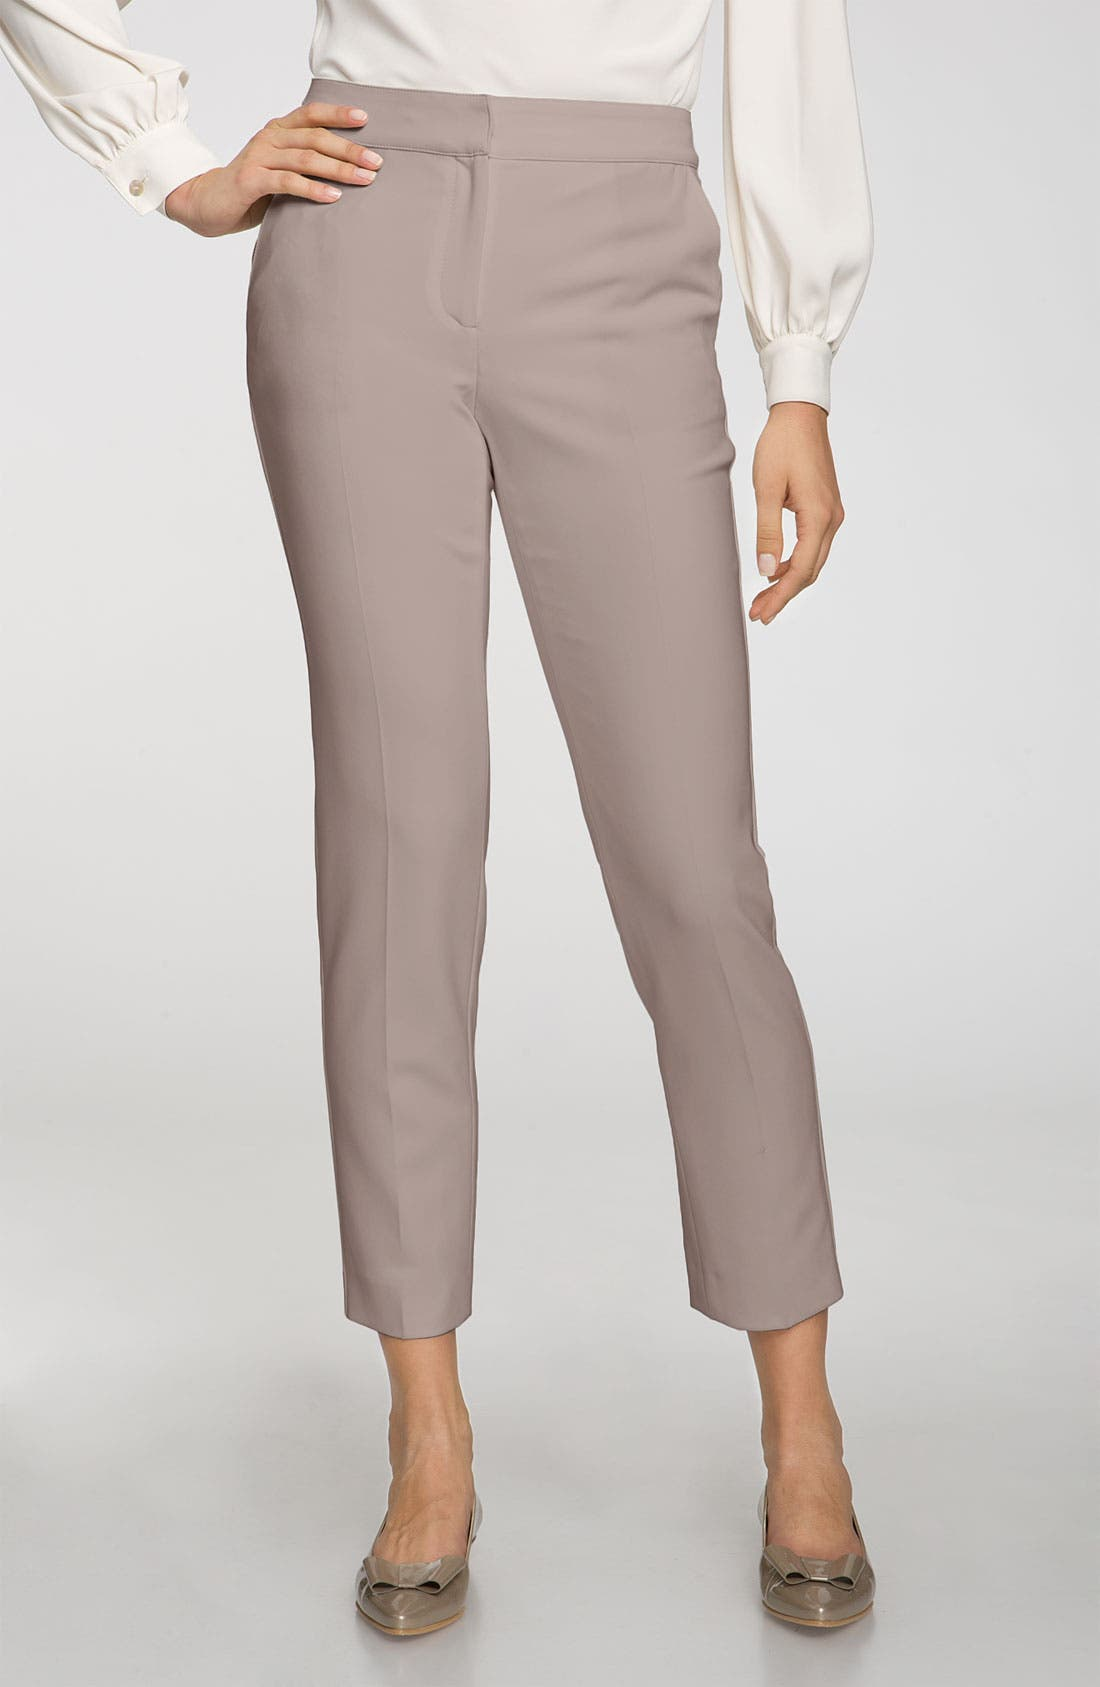 Alternate Image 1 Selected - St. John Collection 'Emma' Crepe Marocain Crop Pants